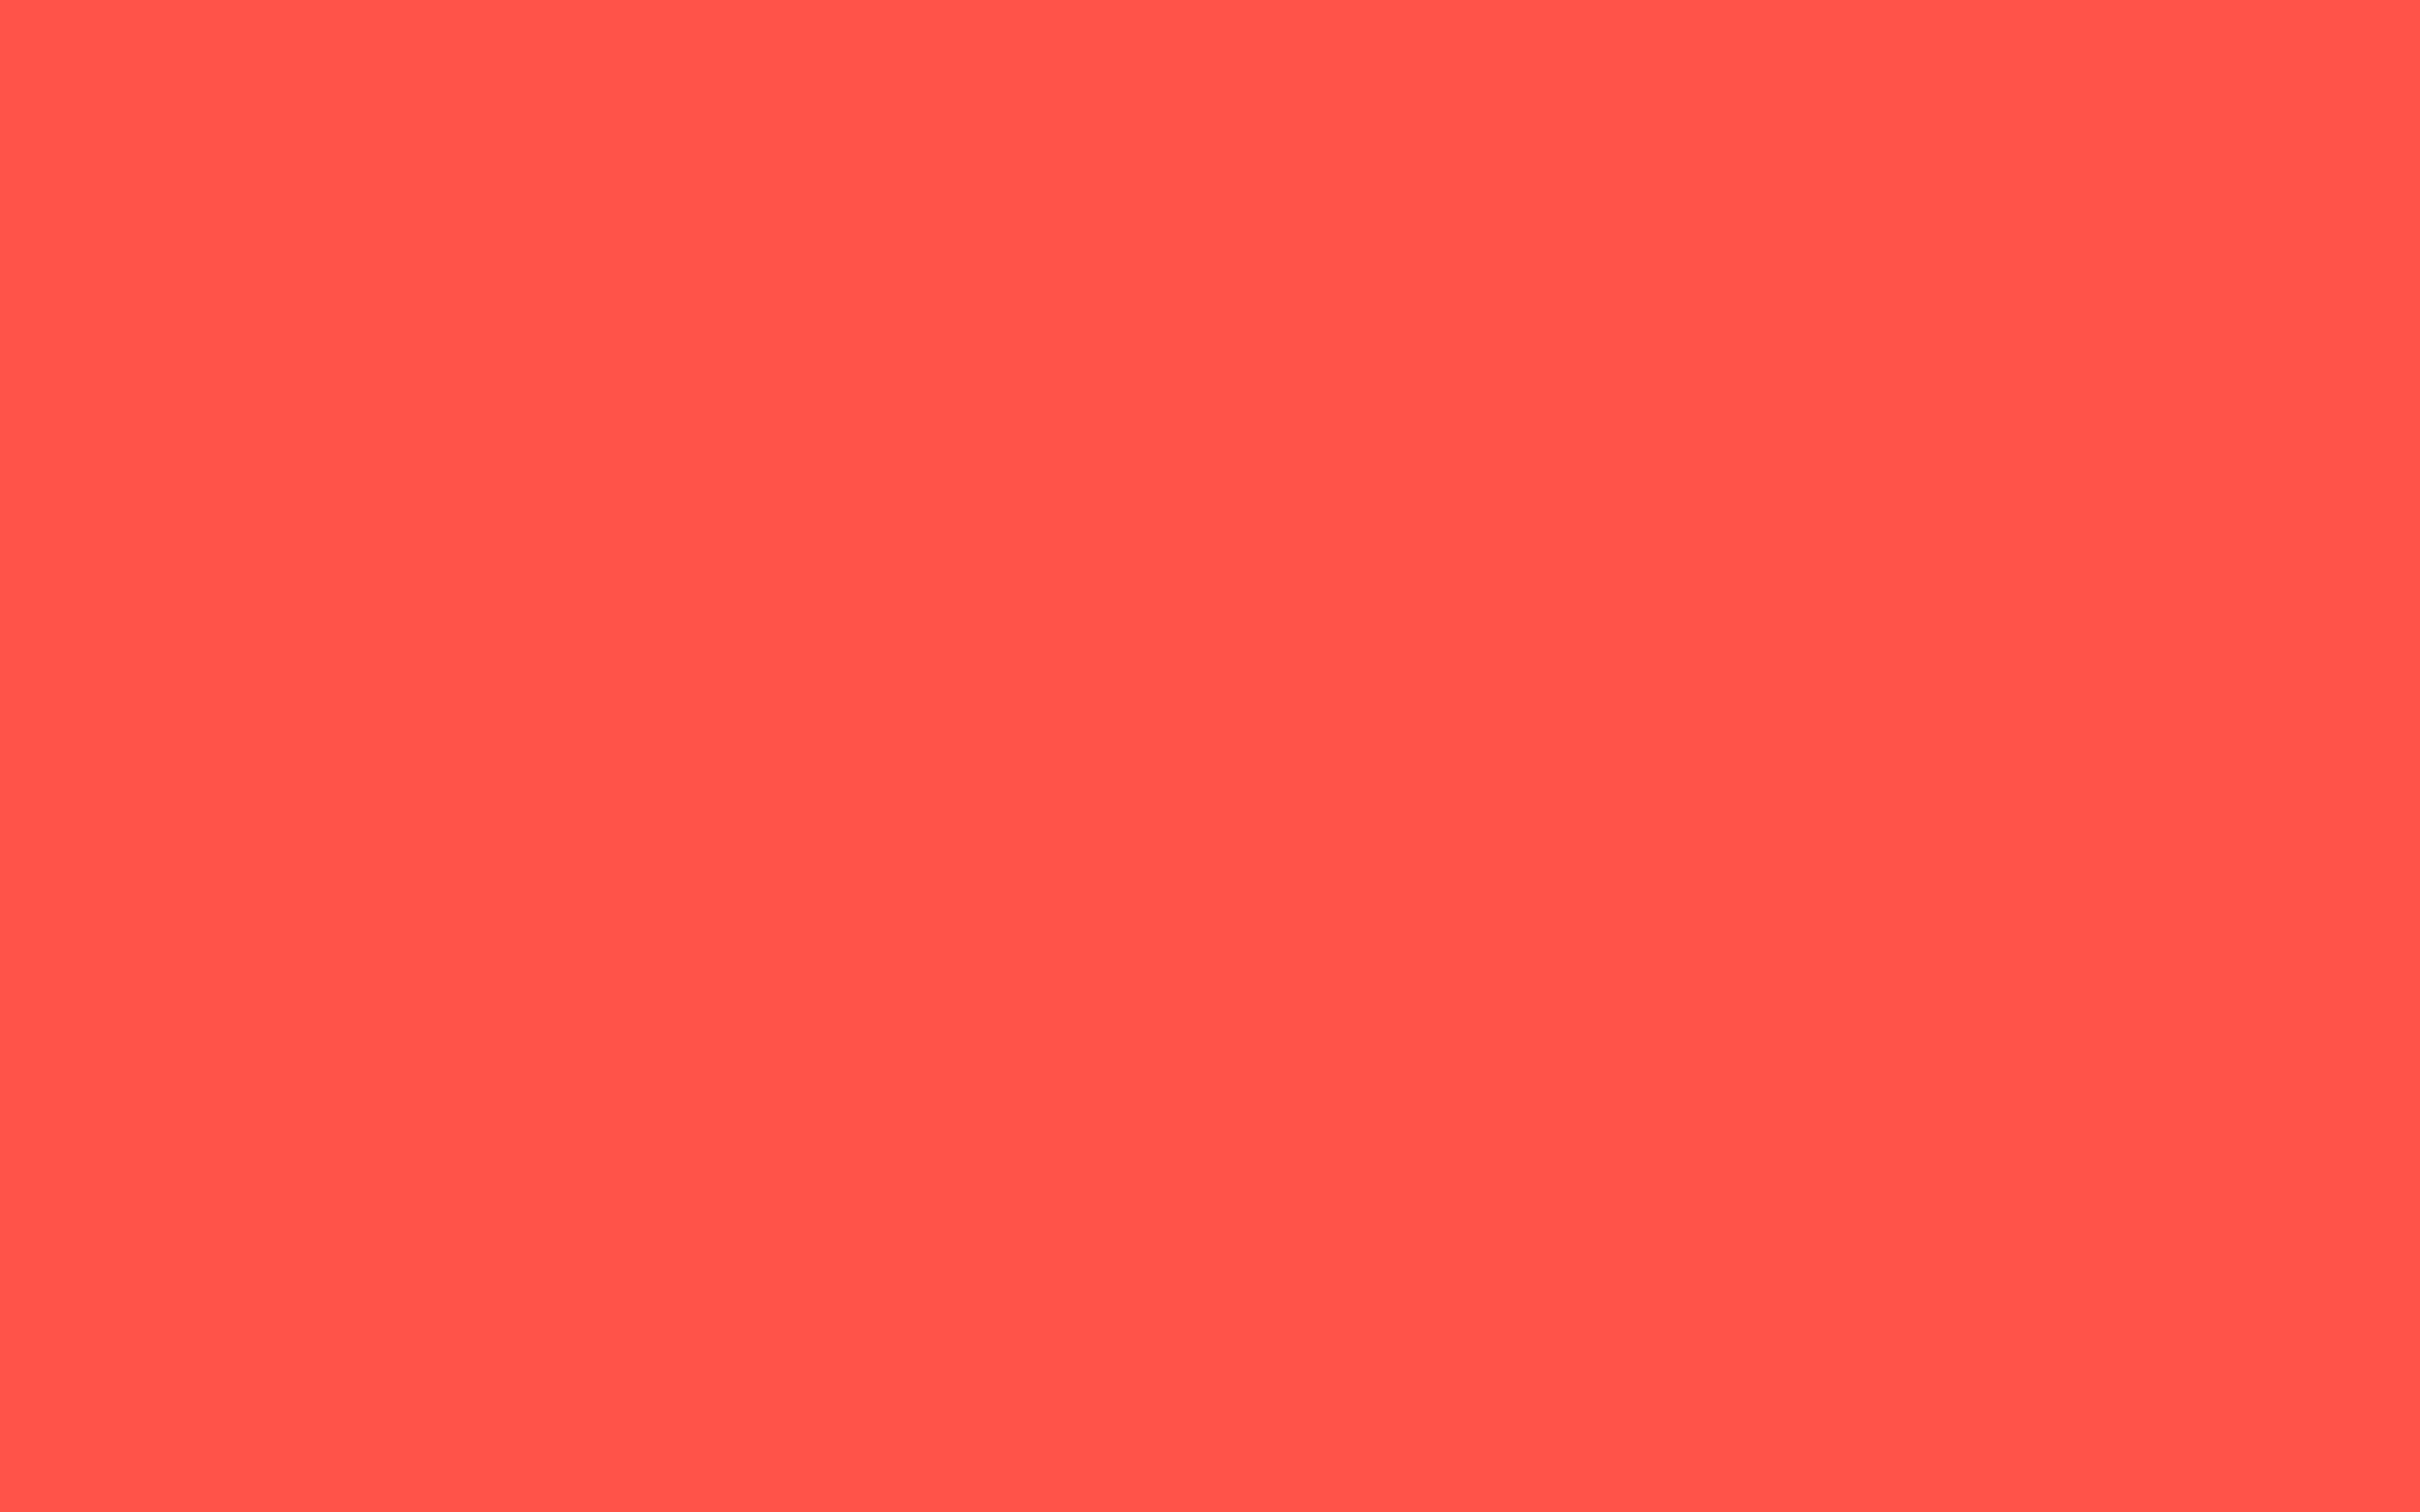 Solid Orange image